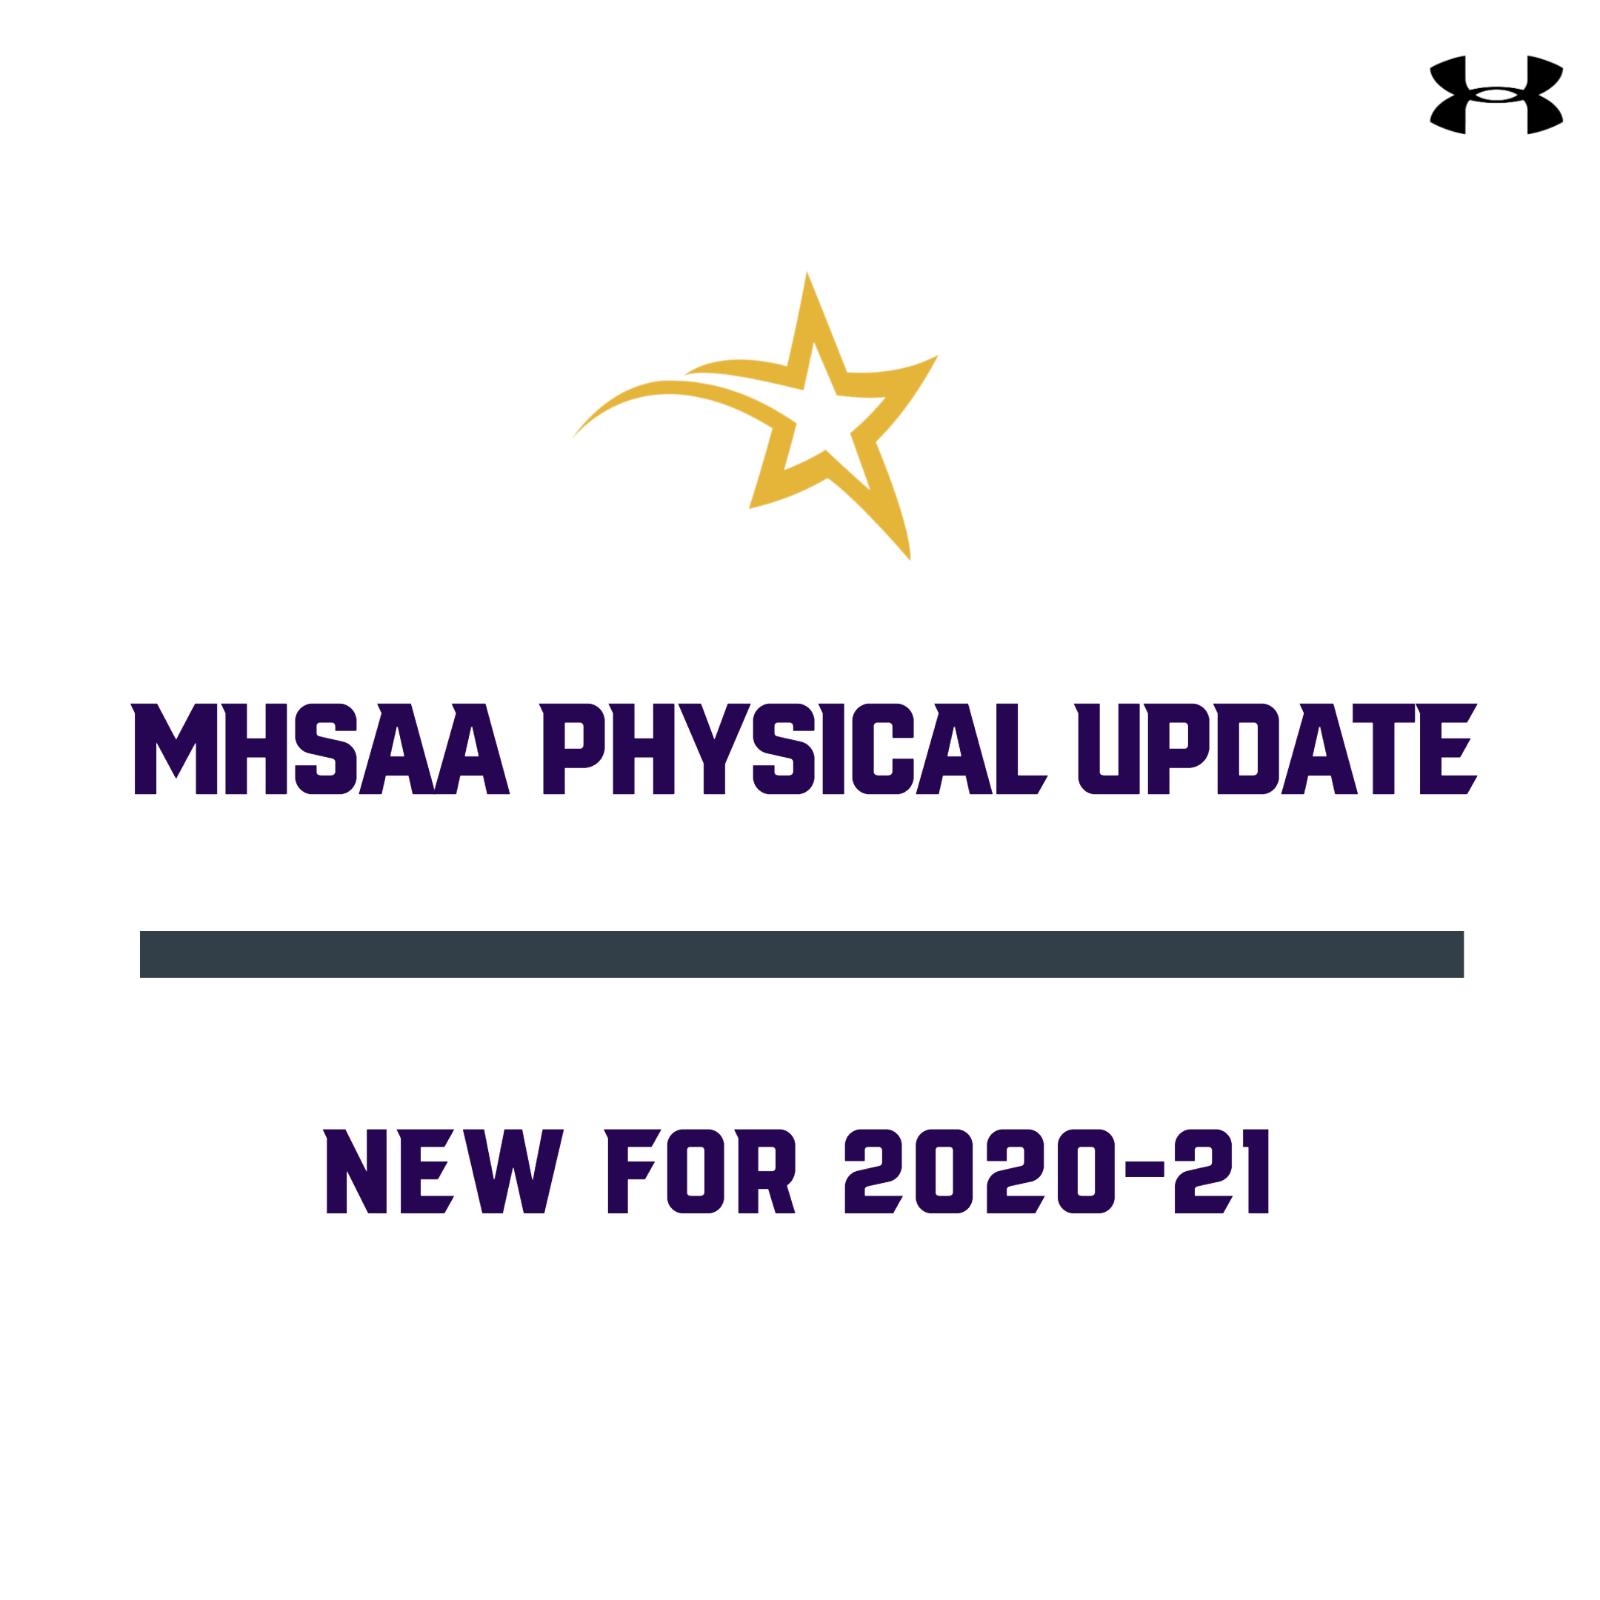 MHSAA PHYSICAL UPDATE